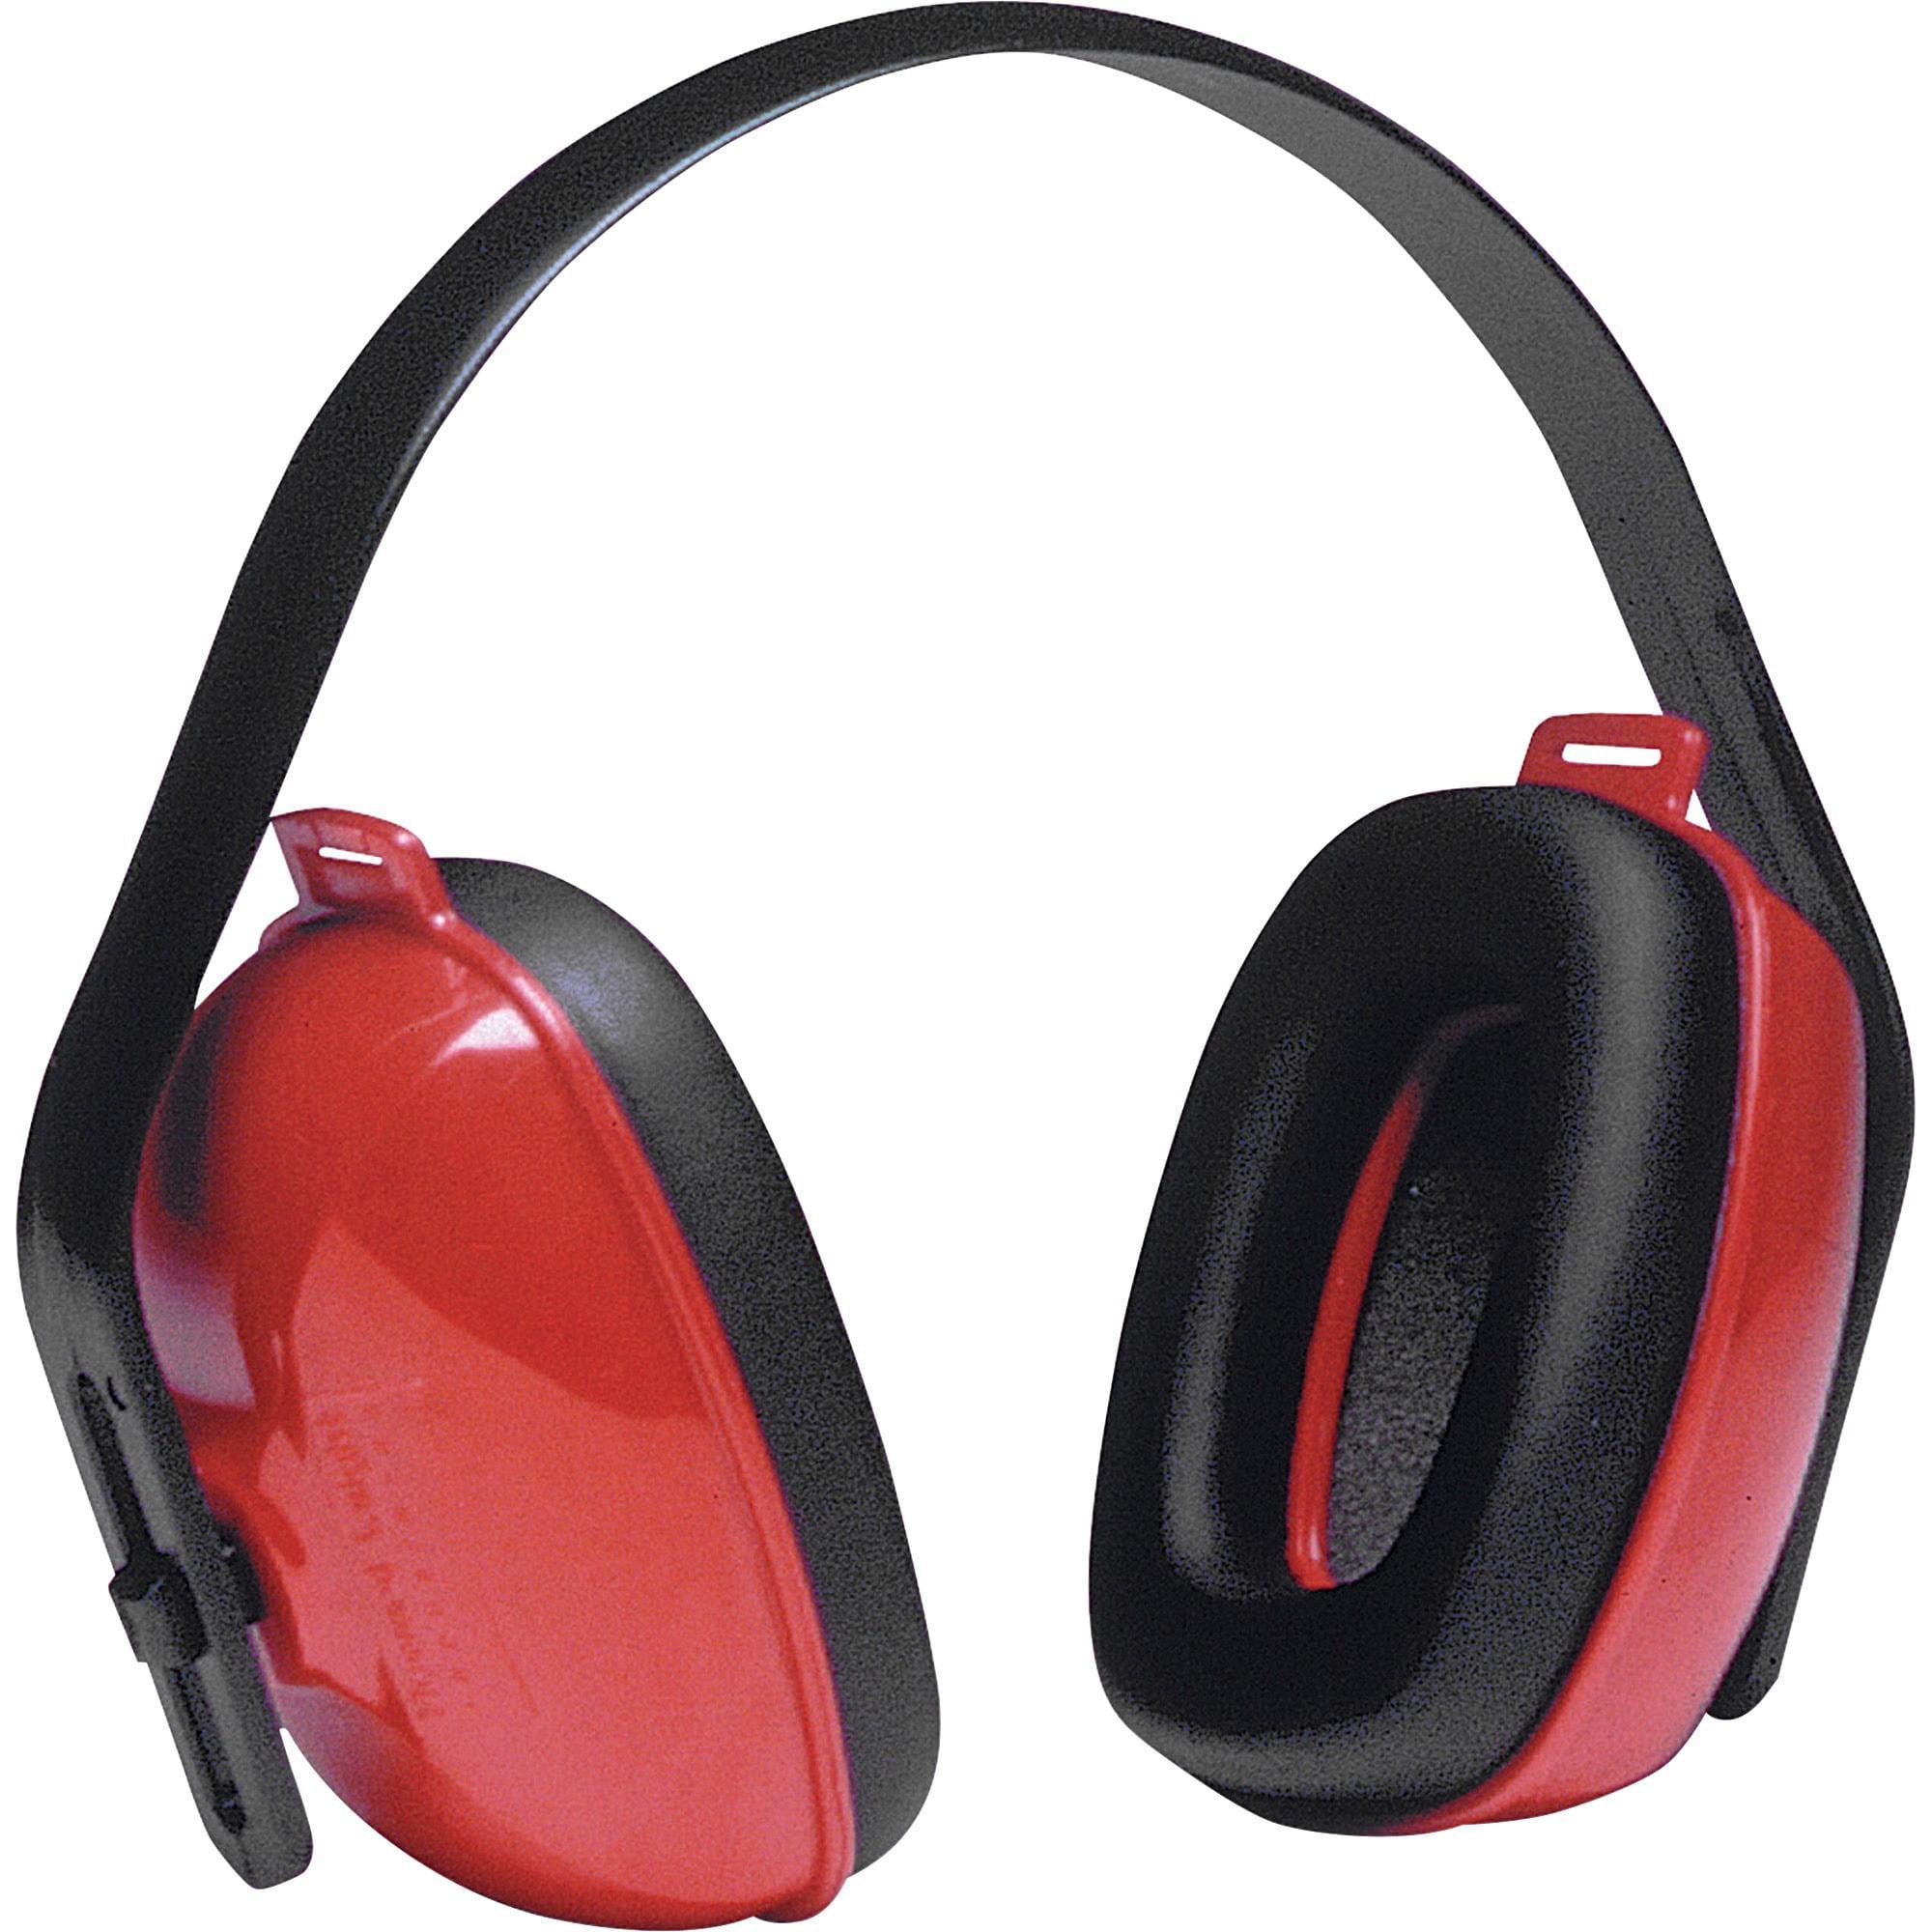 Howard Leight, HOWQM24, QM24 Plus Red Cup Ear Muffs, 1 Each, Red